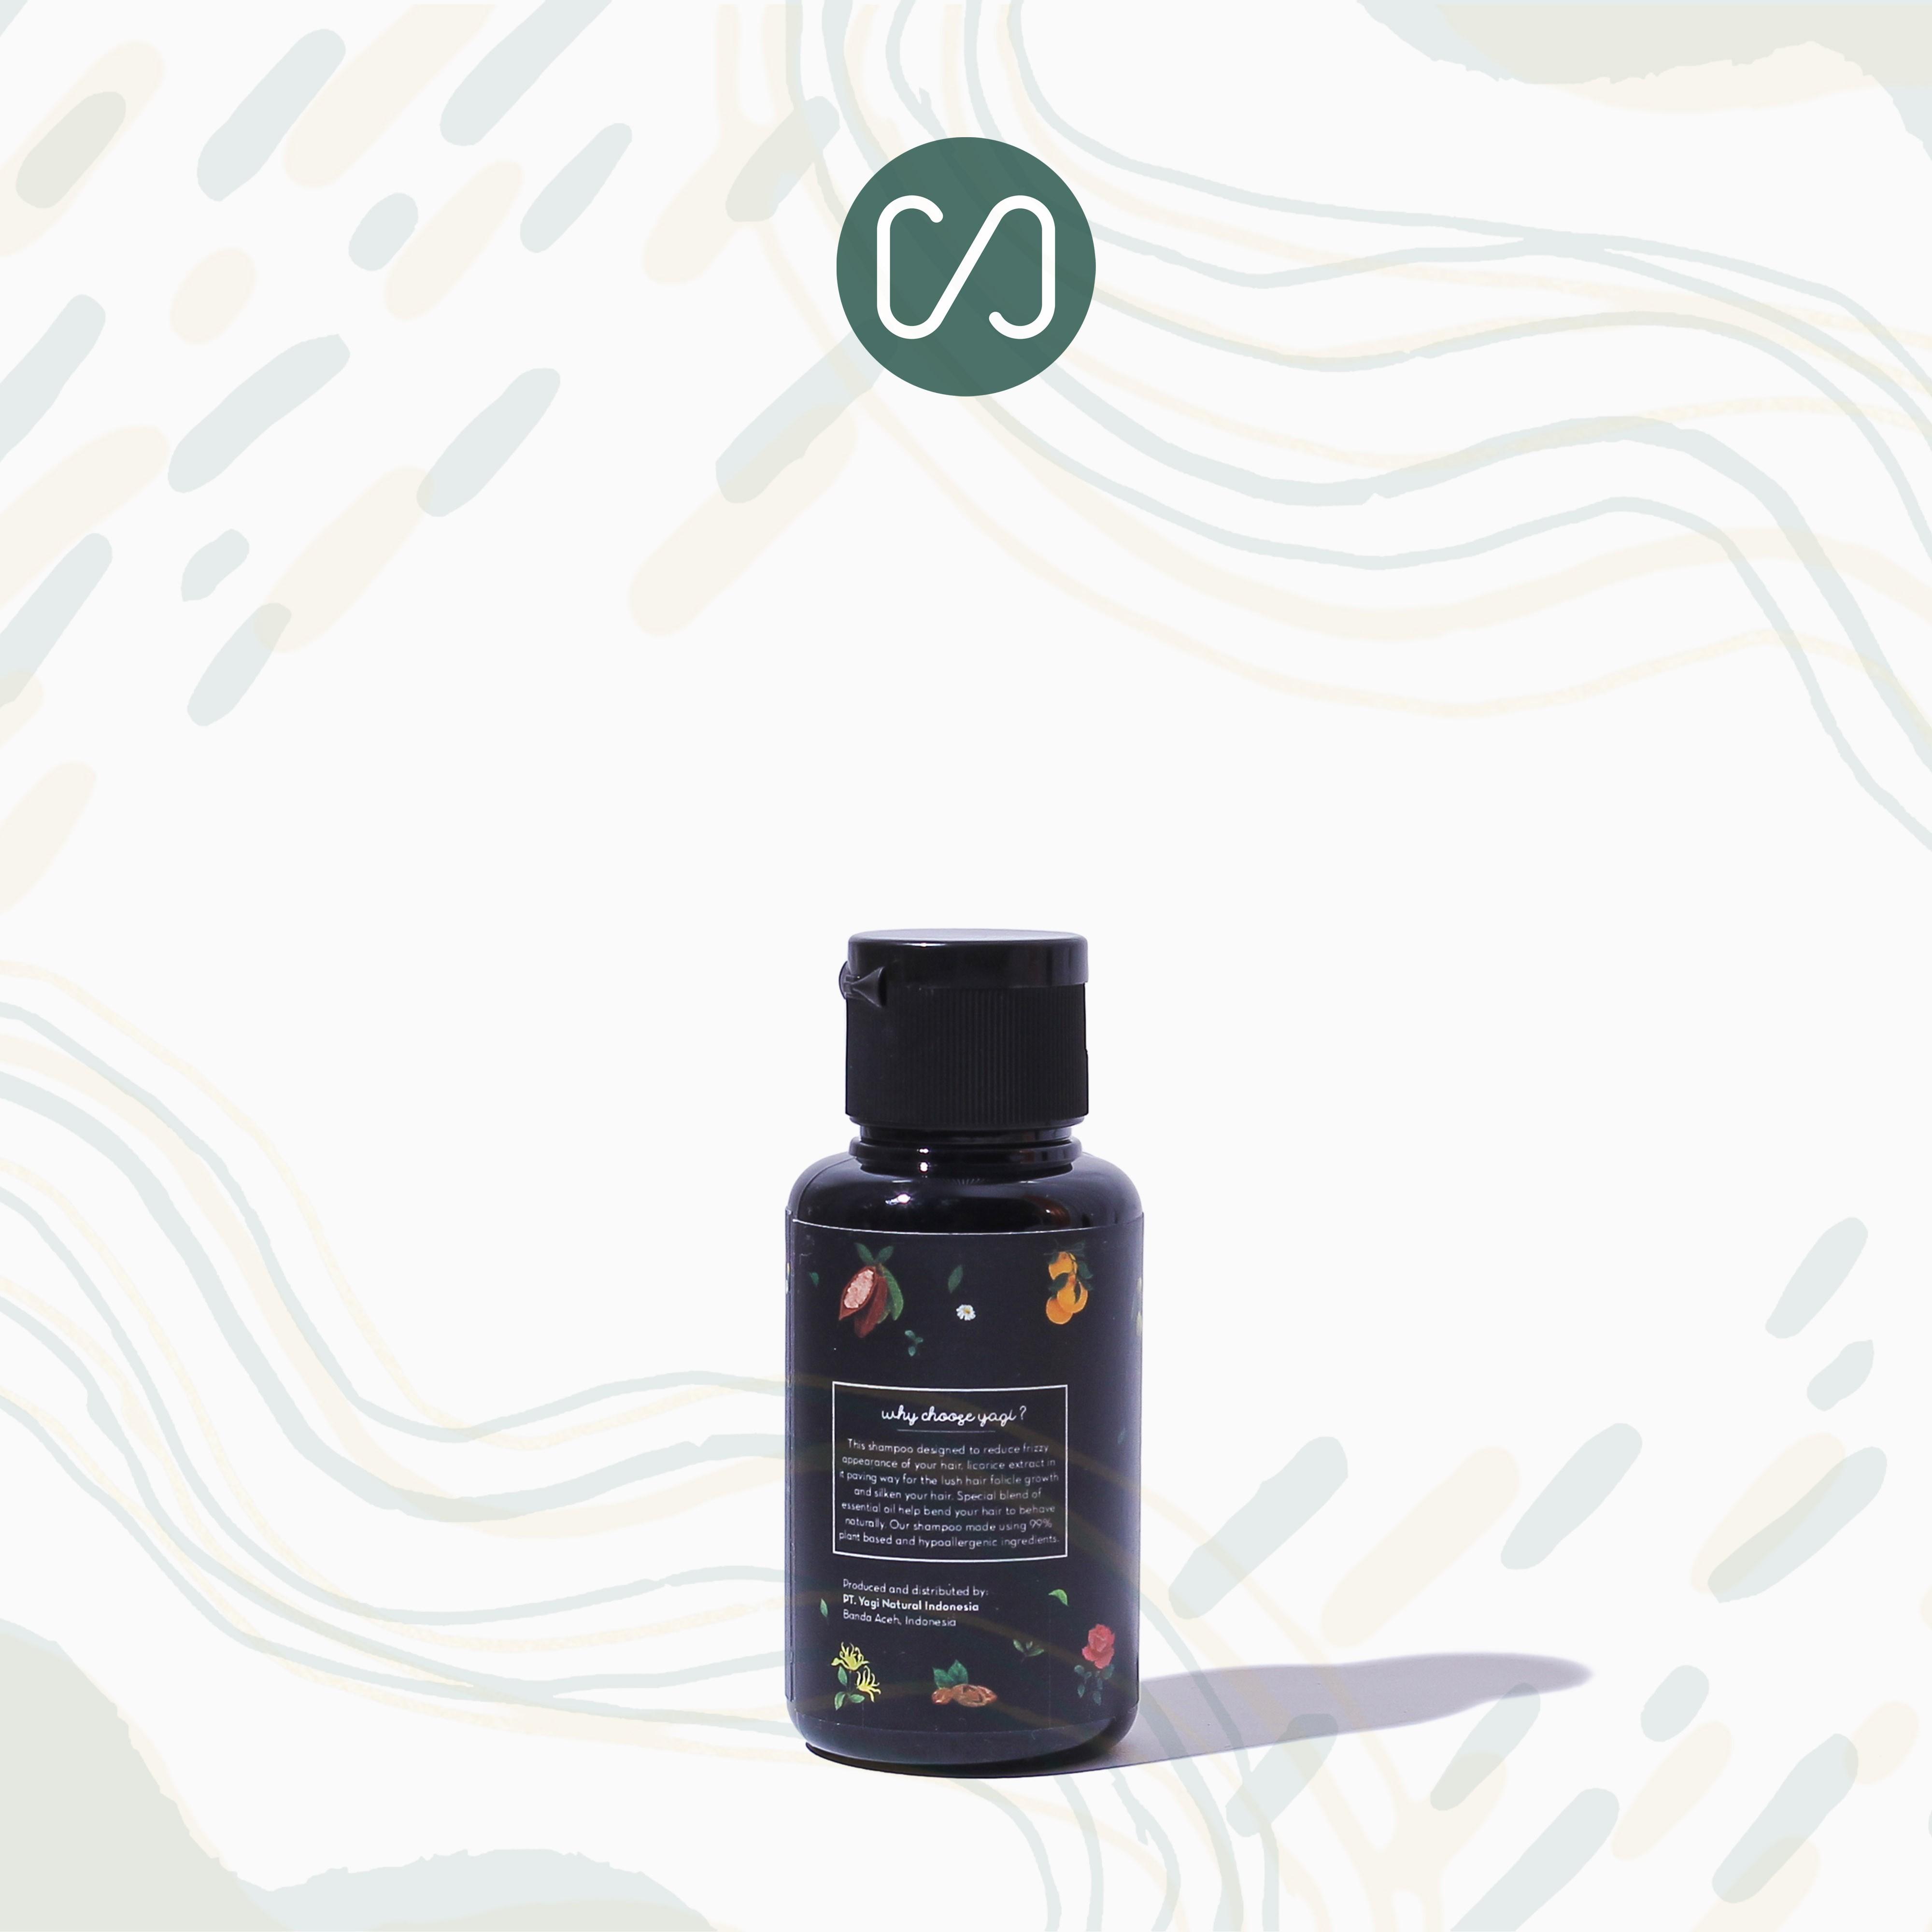 Sustaination - Yagi Natural - Shampo Cair Alami untuk Rambut Berminyak - Good Hair Day-3